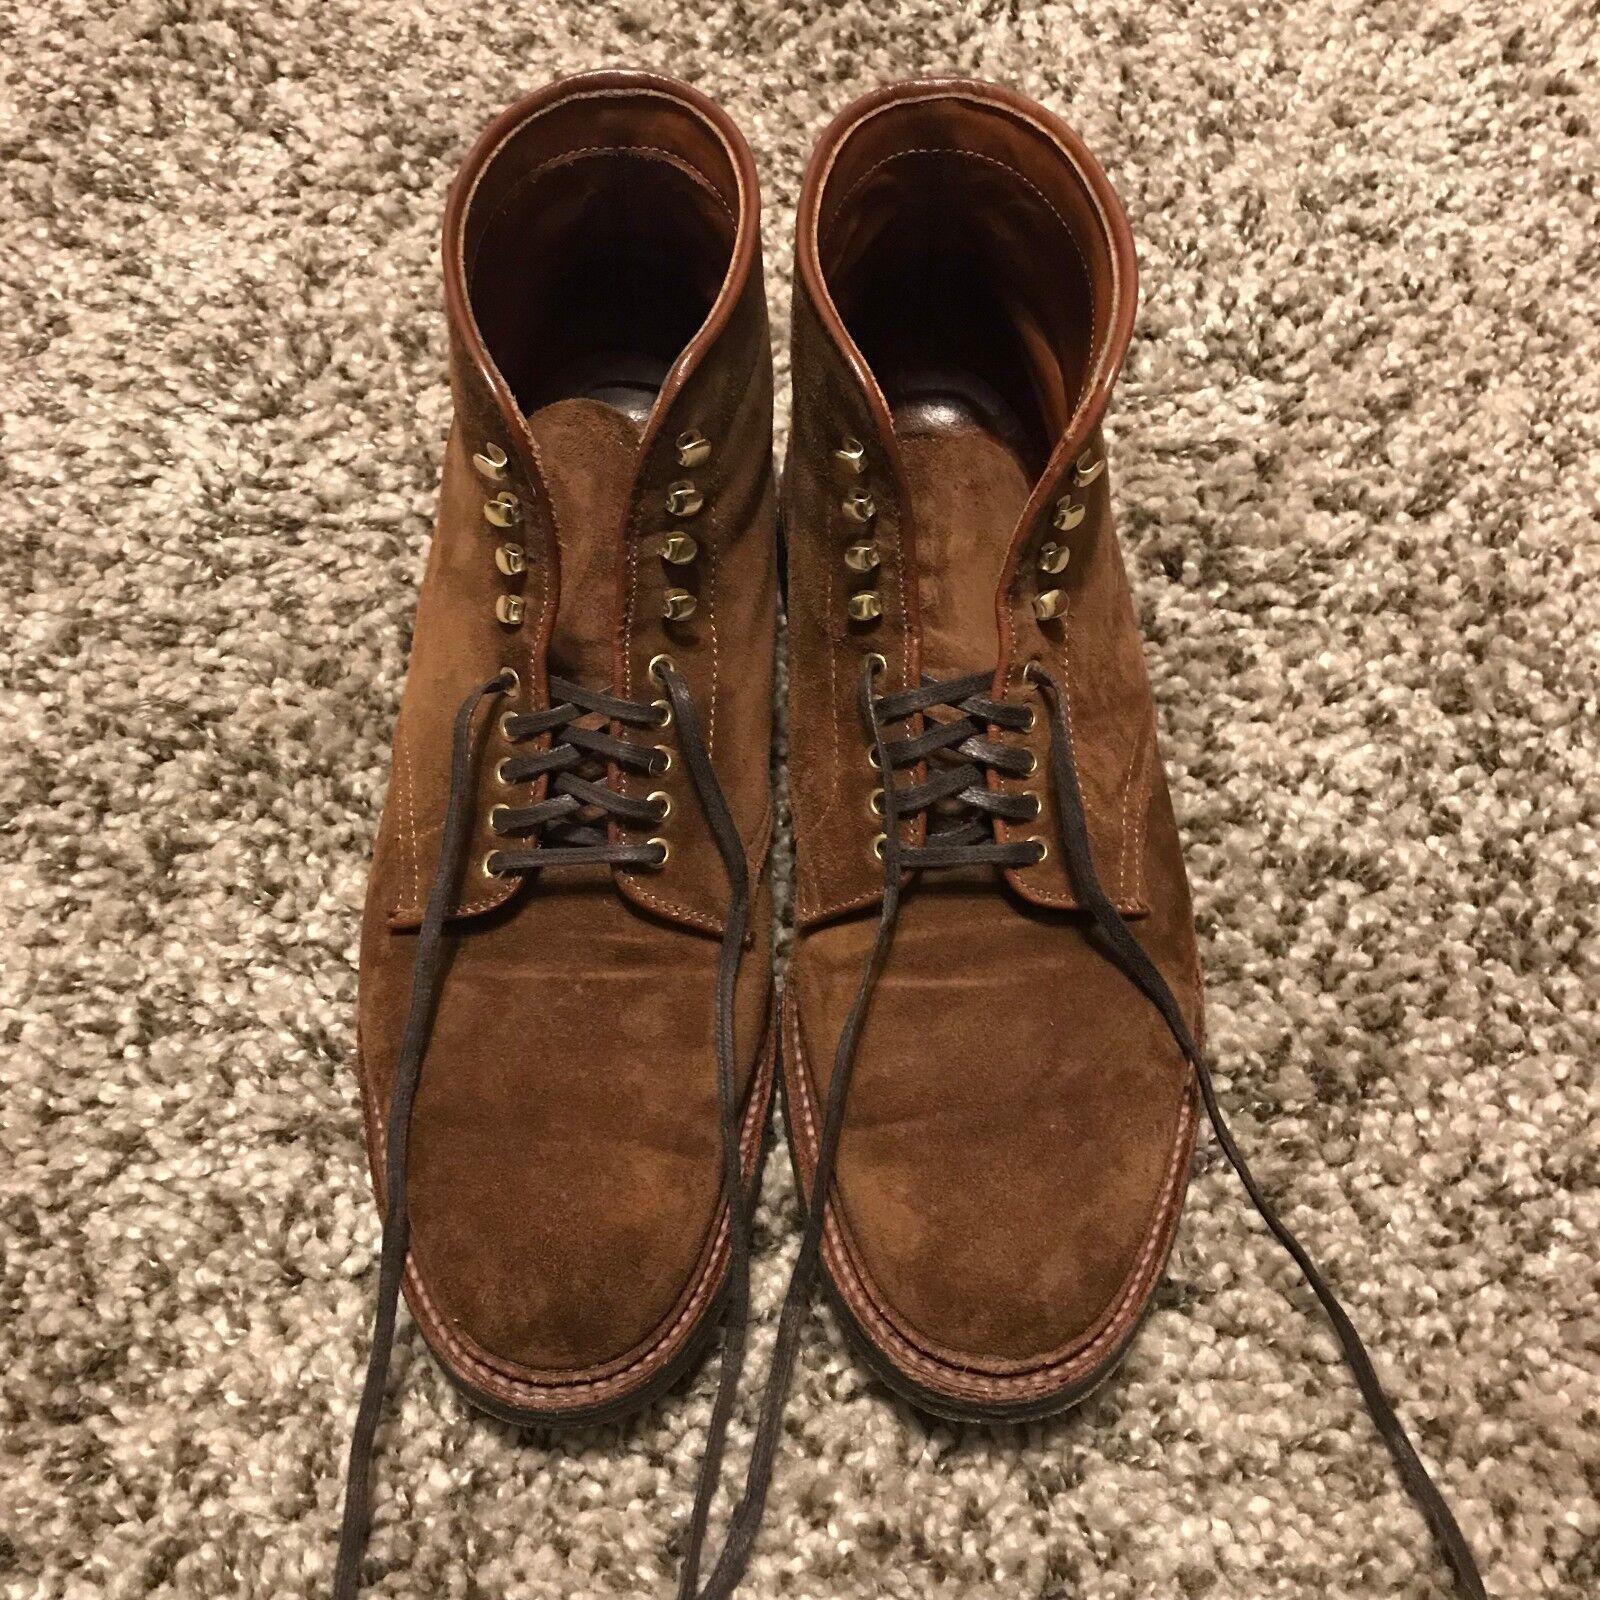 Alden Men's scarpe - All-Weather Walker Plain Toe stivali - Snuff Suede - 9.5E